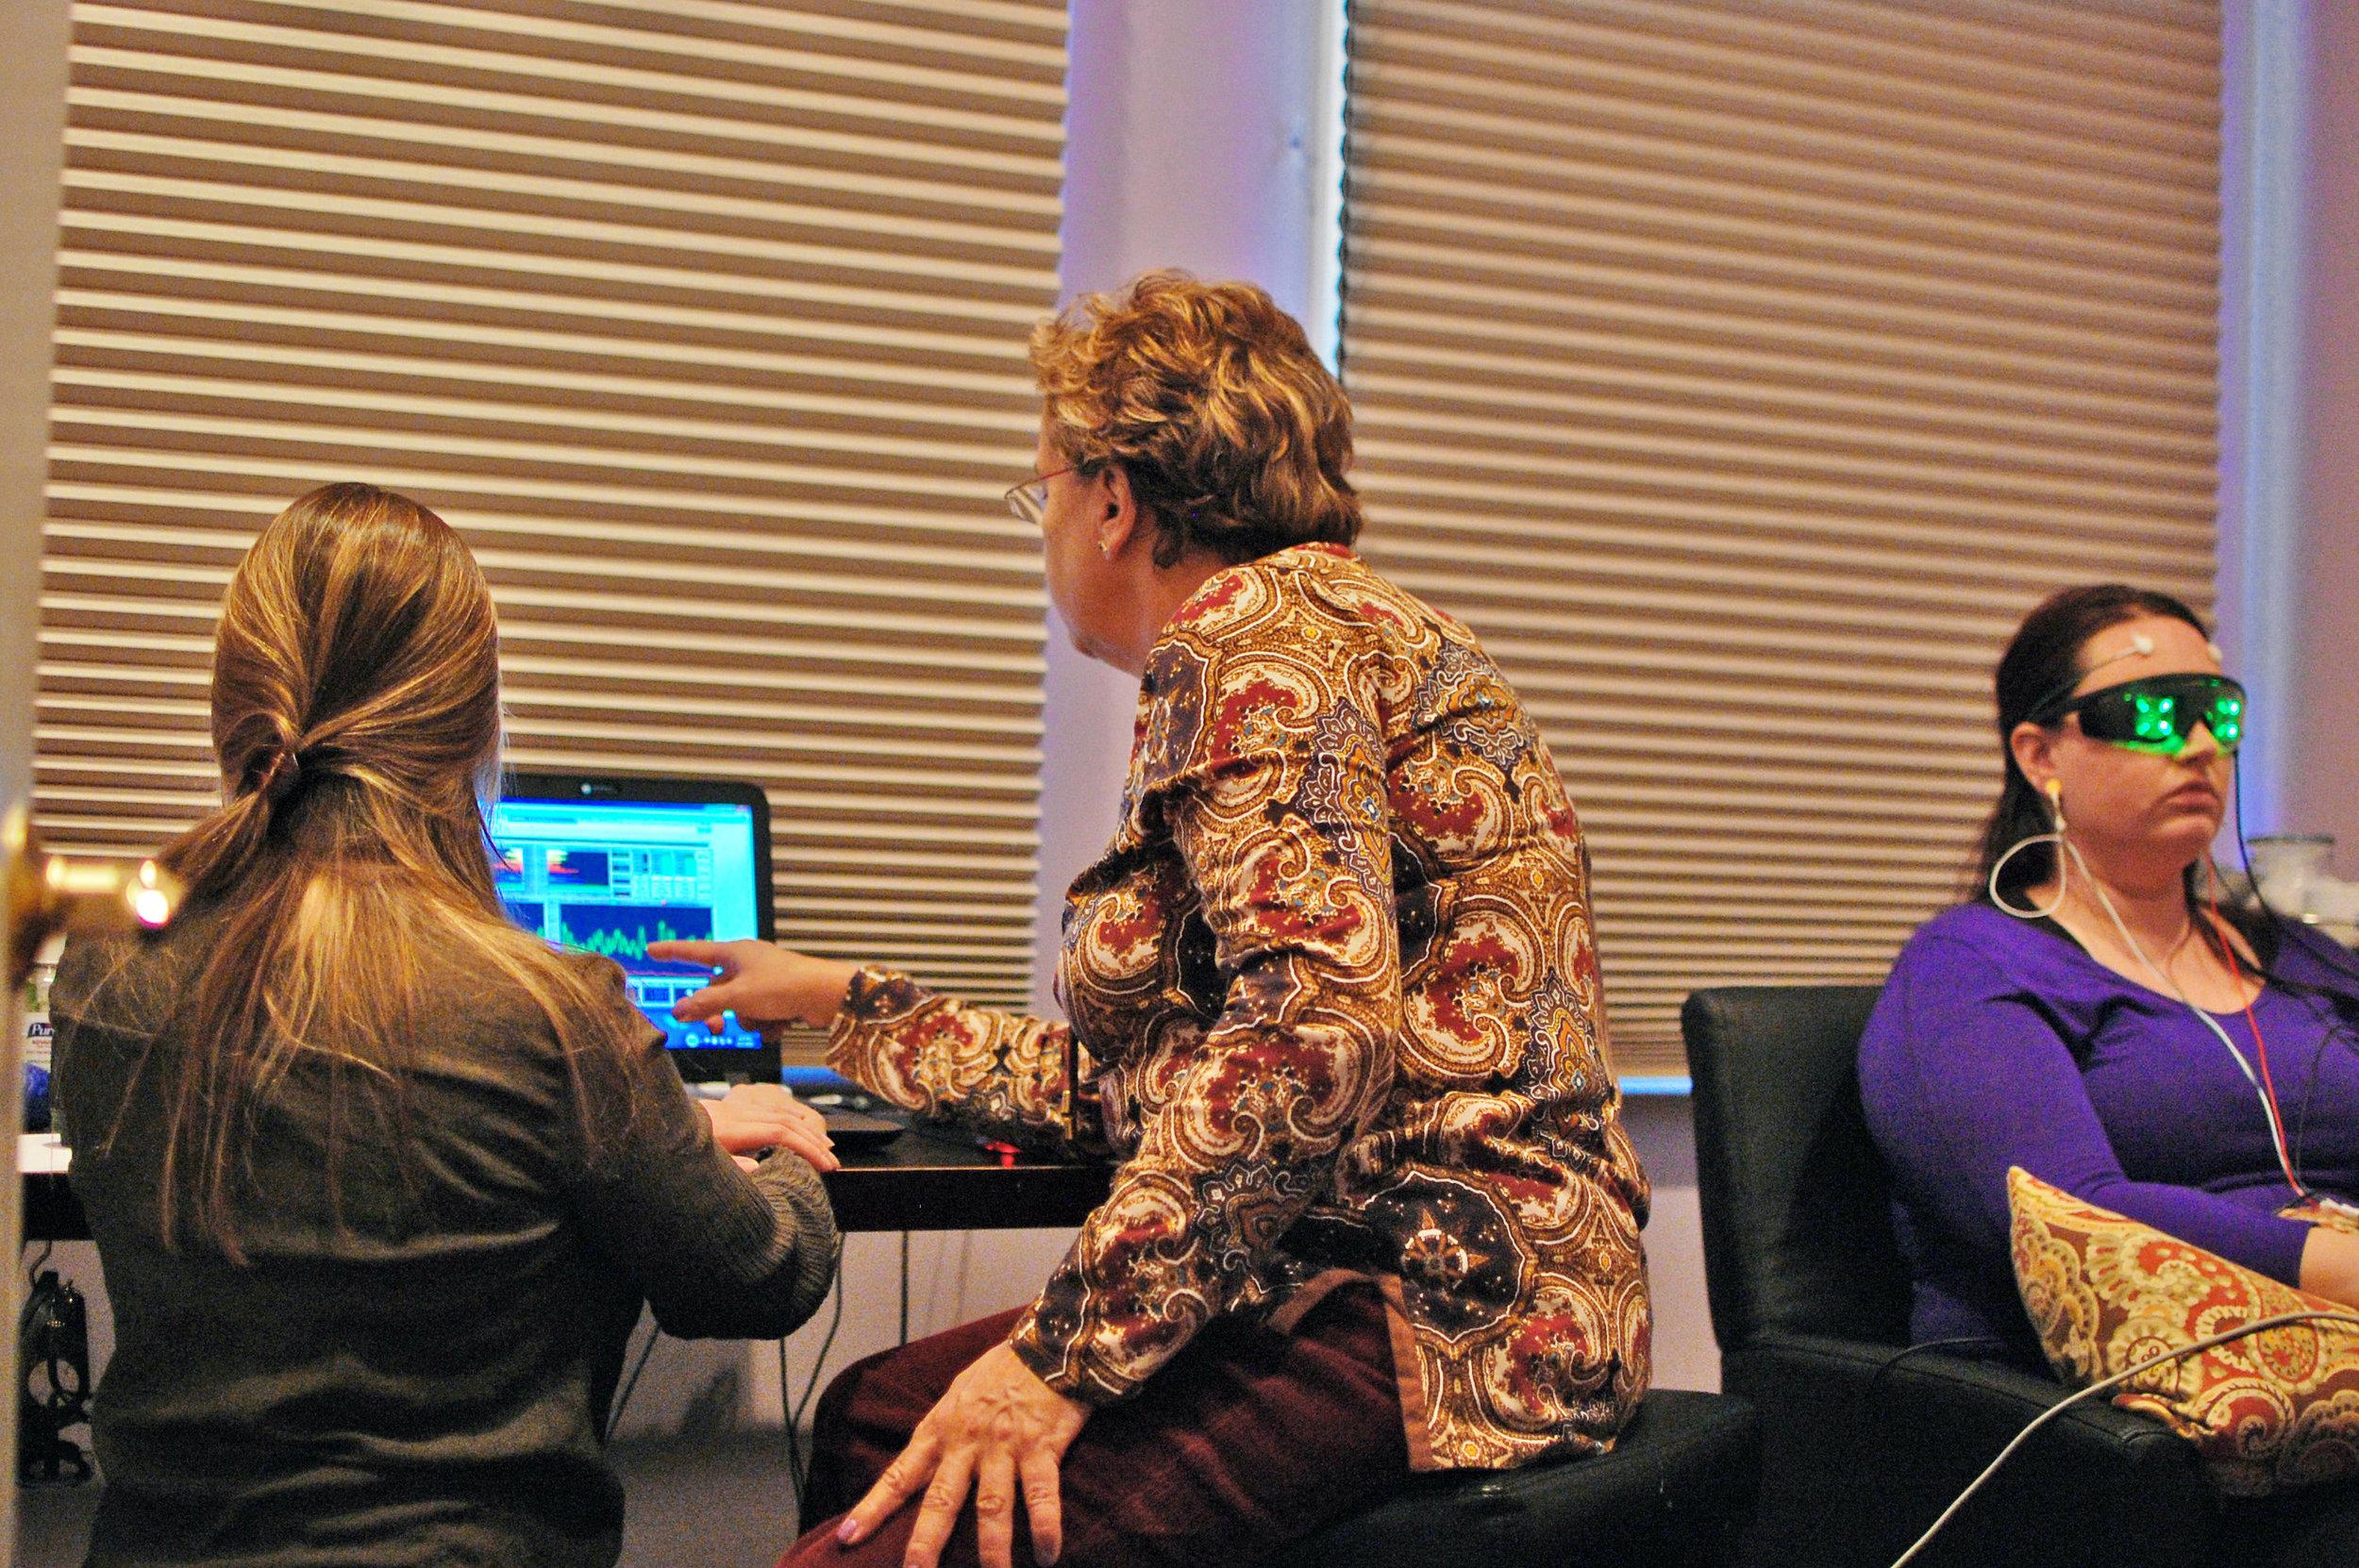 Reviewing Neurofeedback Results